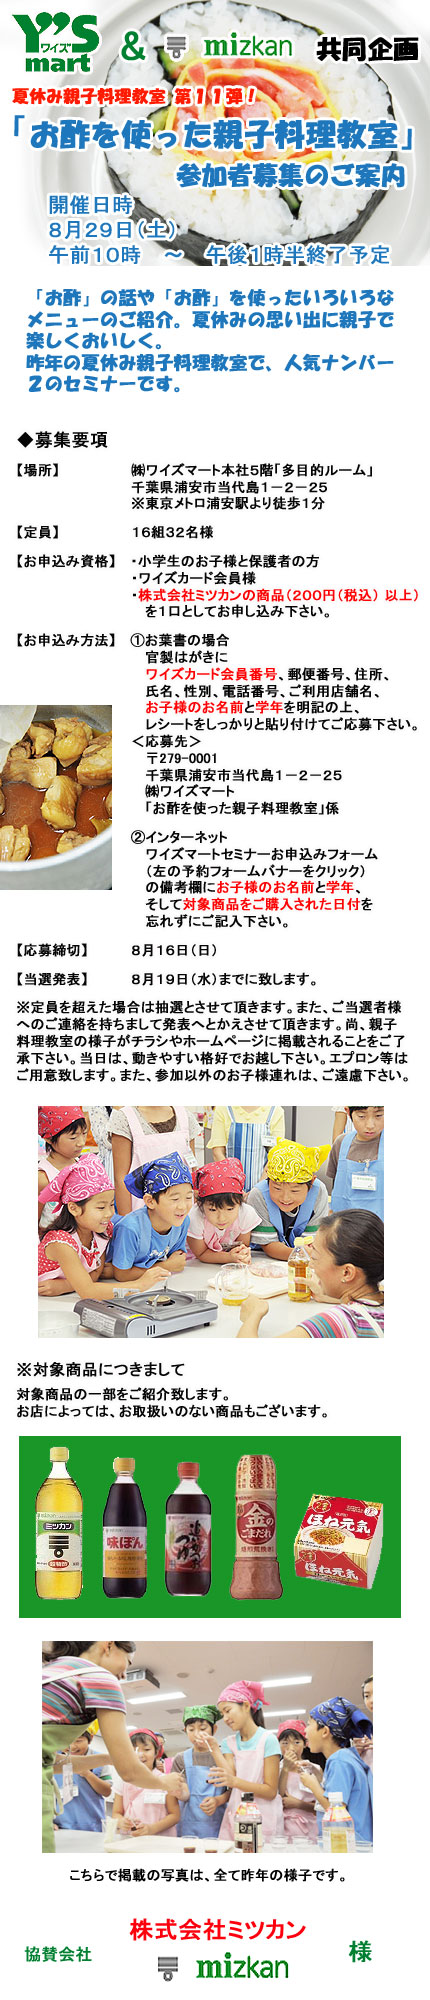 09親子お酢料理教室.jpg